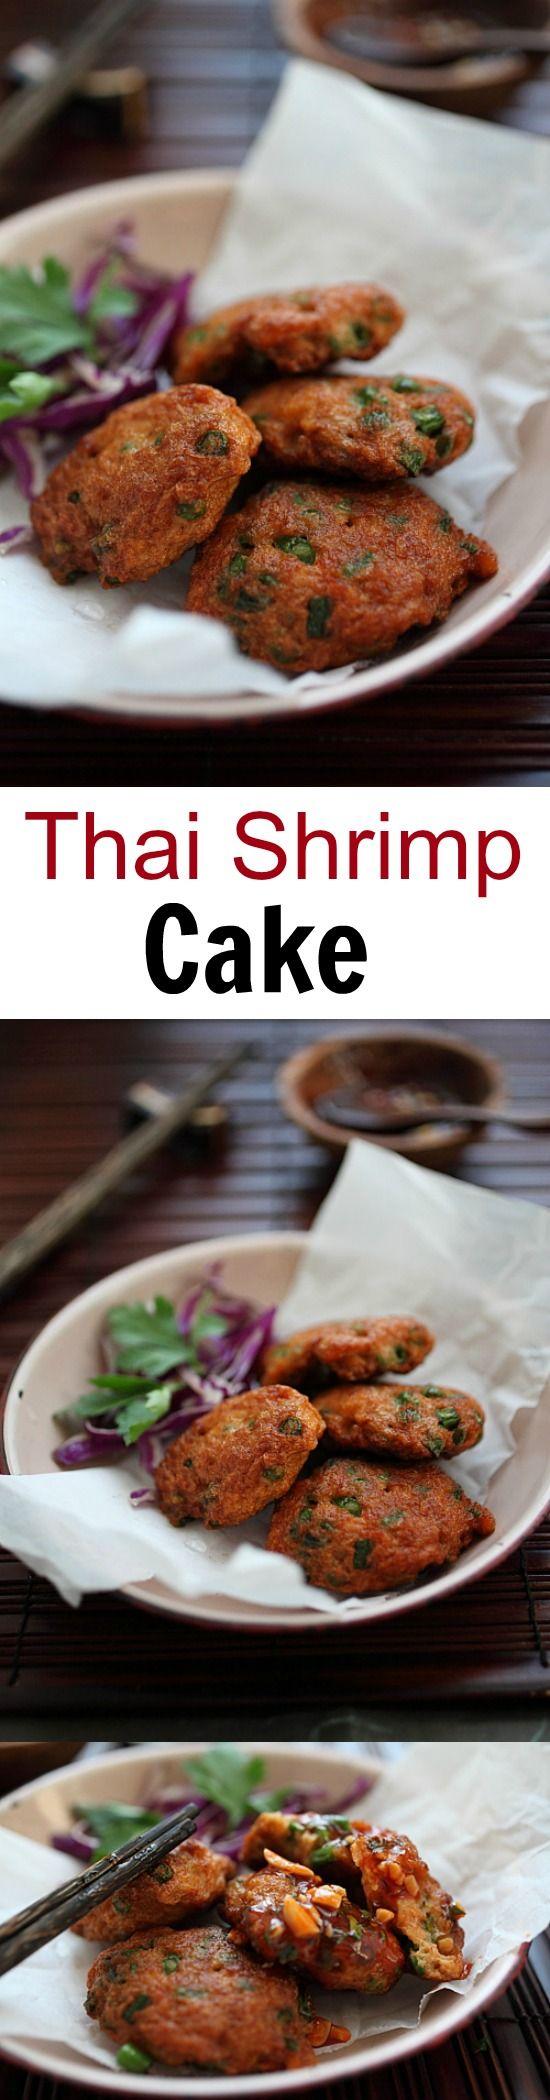 and more cakes thai shrimp sweet chili chili recipe shrimp cakes ...